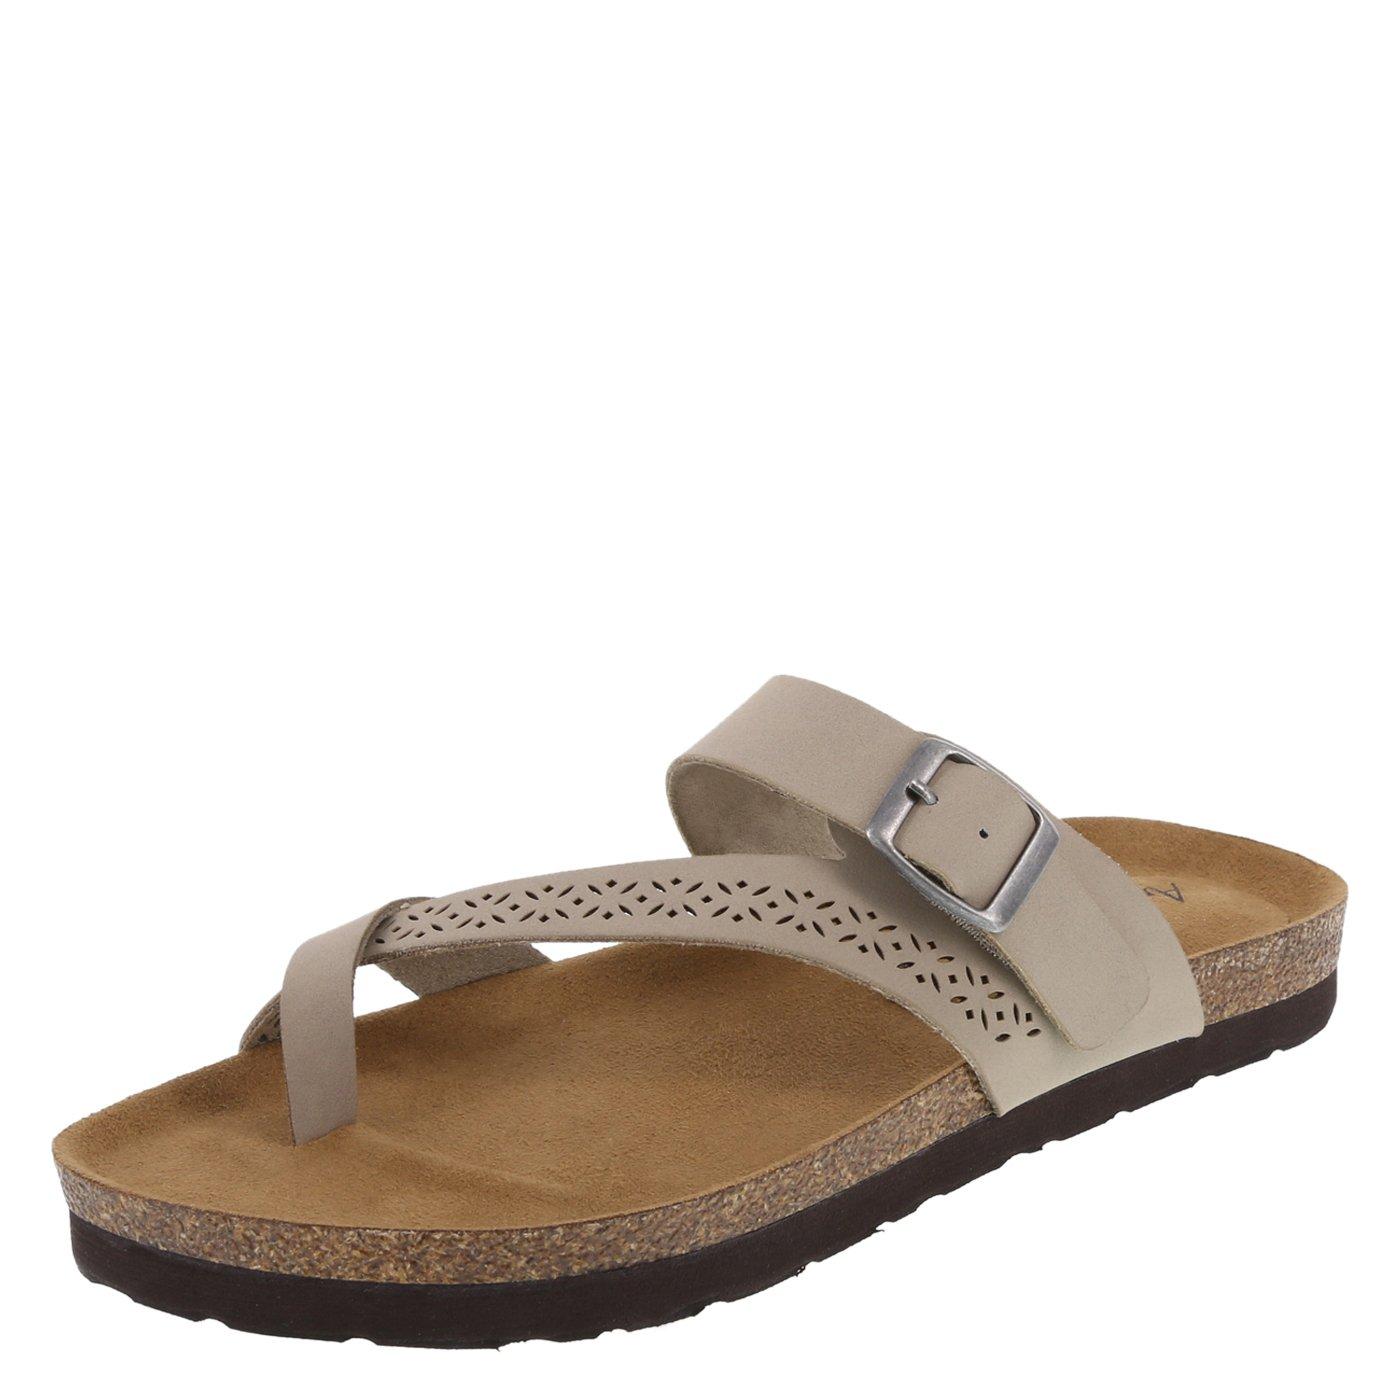 ca12c5df30037 Lower East Side Light Taupe Women's Opal Flat Sandal 11 Regular